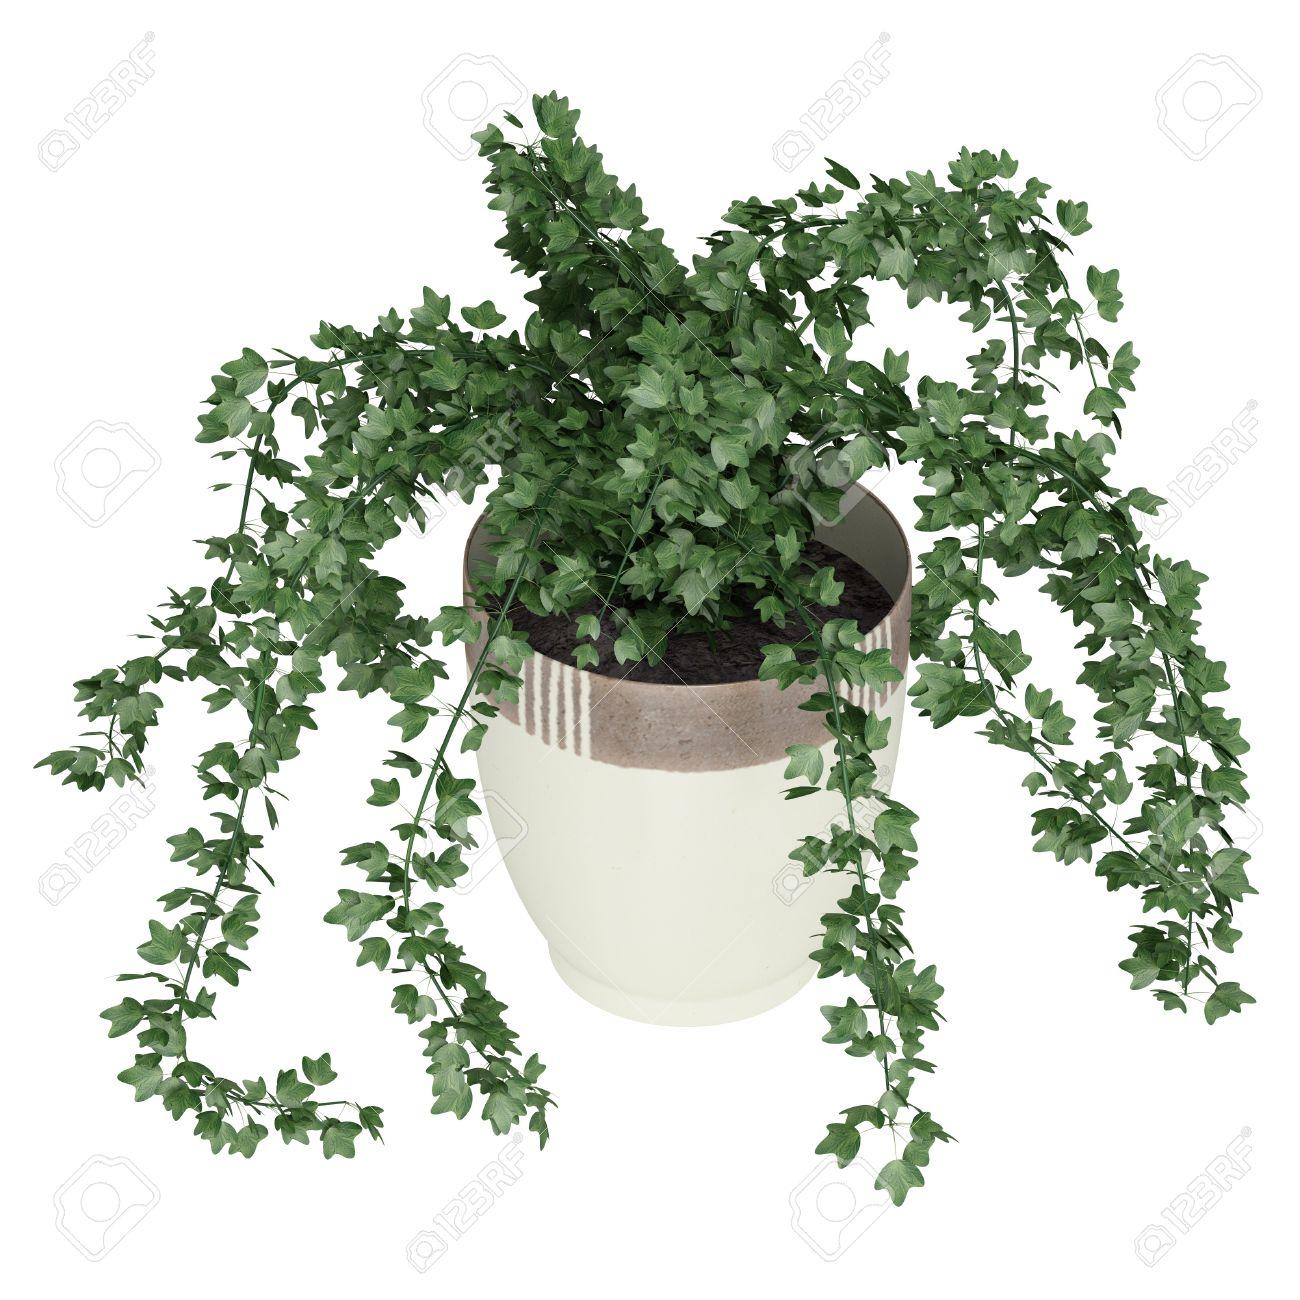 ivy houseplant, yucca elephantipes house plant, ivy water plant, ivy ice plant, ivy flower, ivy indoor plant, on ivy house plant pot